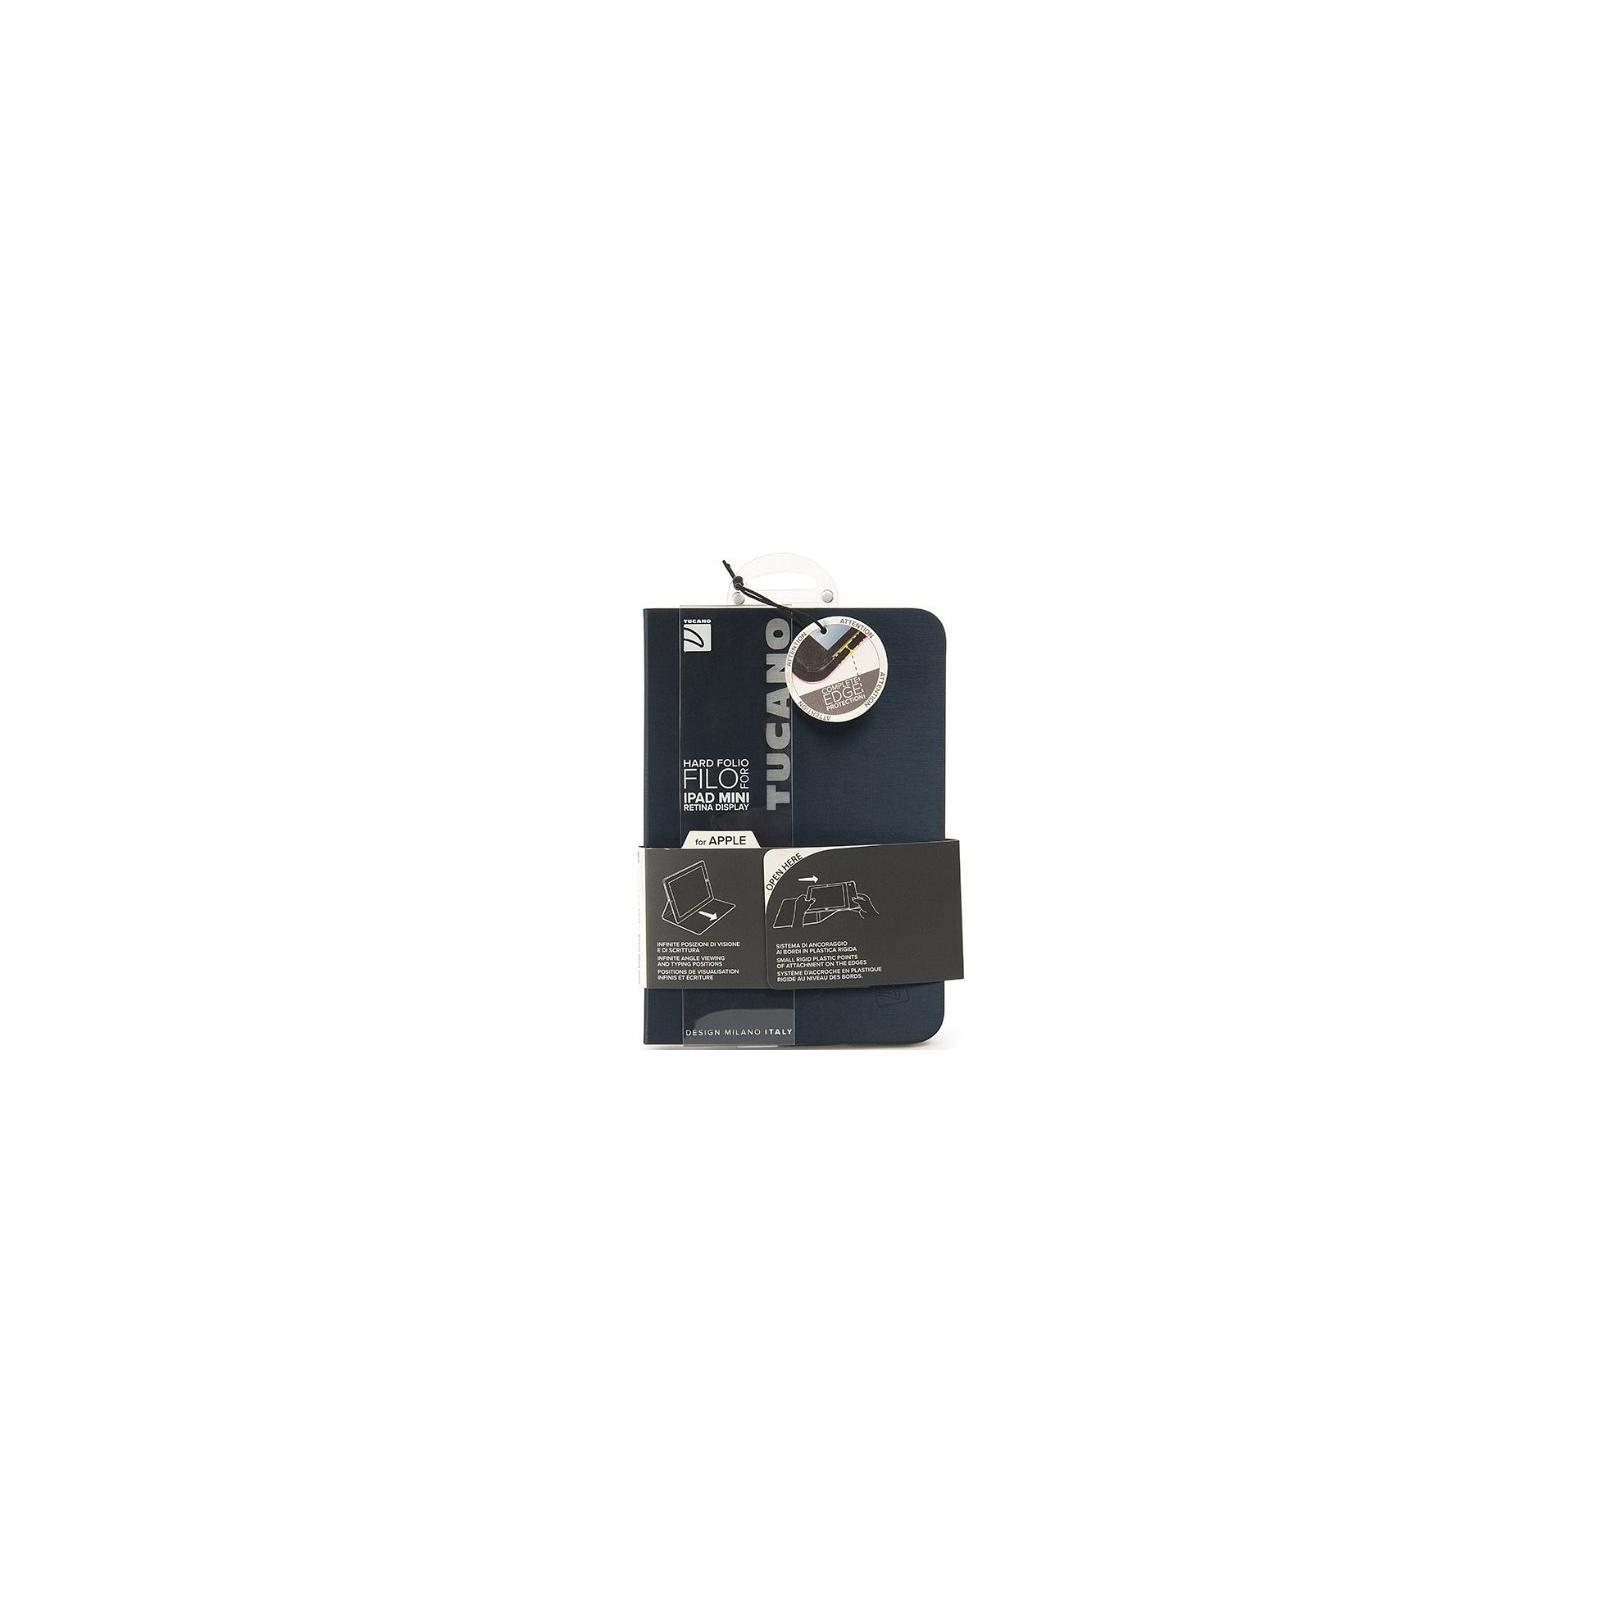 Чехол для планшета Tucano iPad Air Filo Blue (IPD5FI-BS) изображение 6